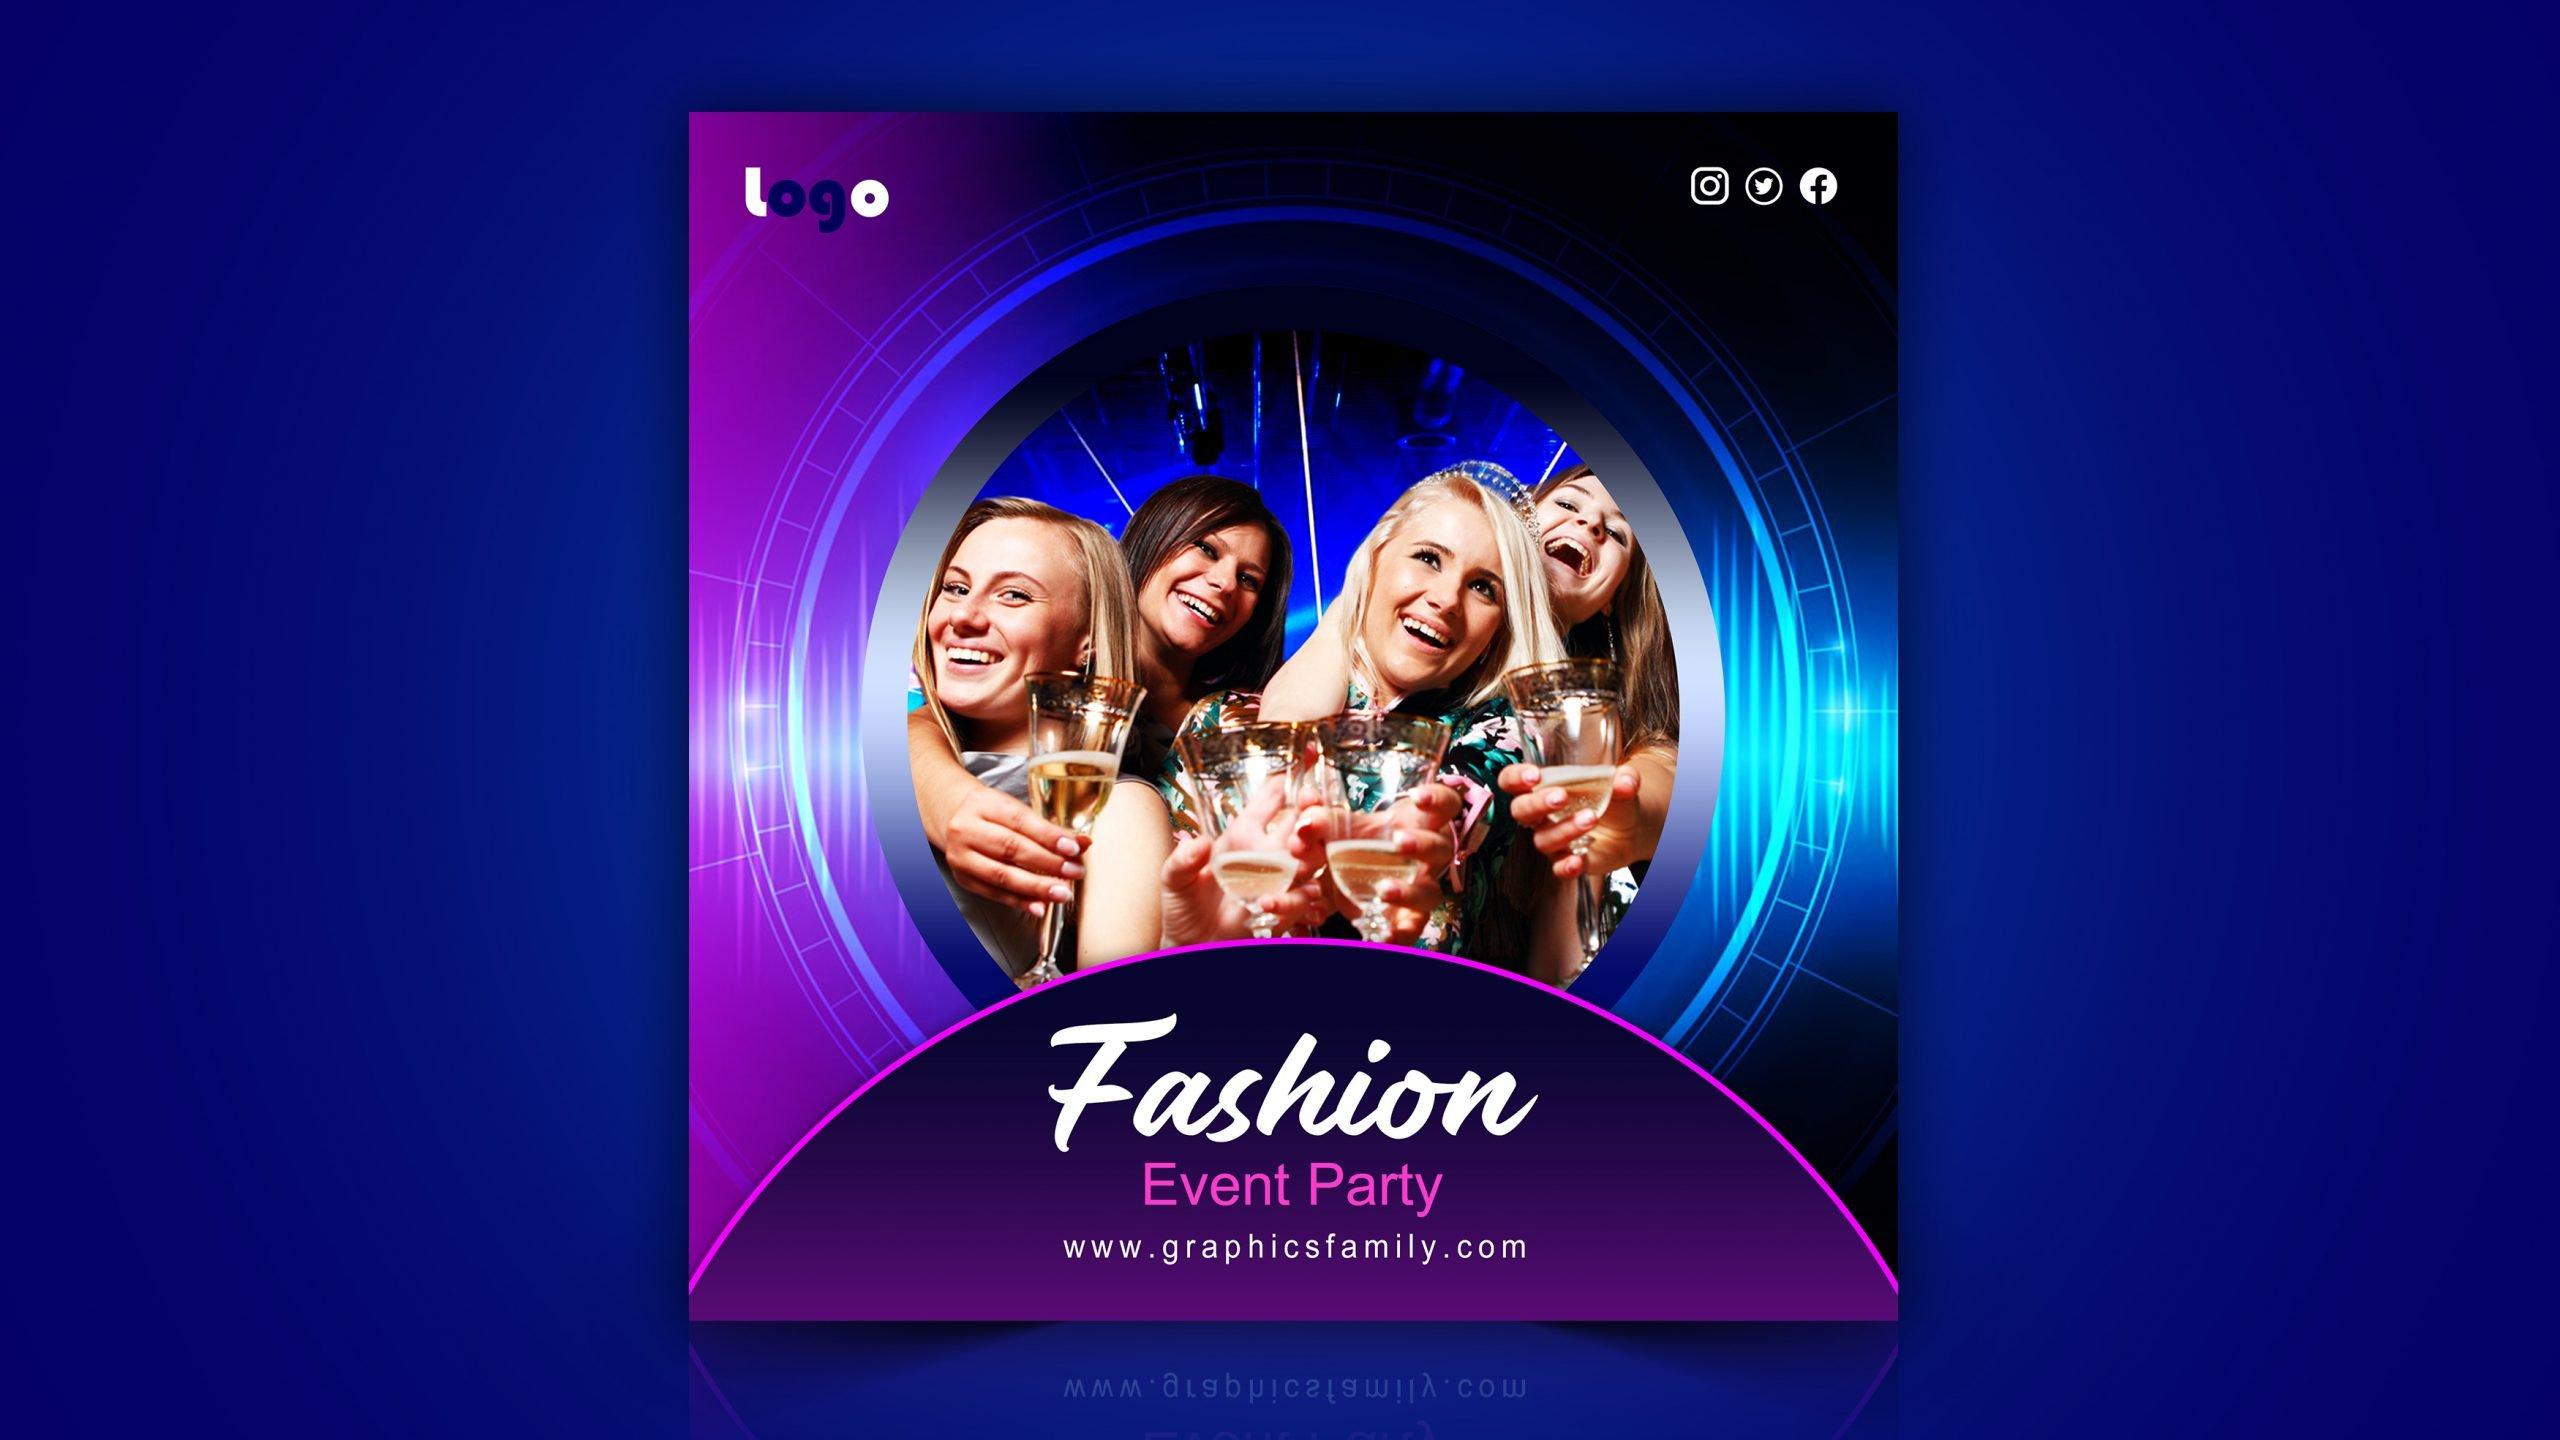 Fashion Design Event Free Instagram Post Design Download